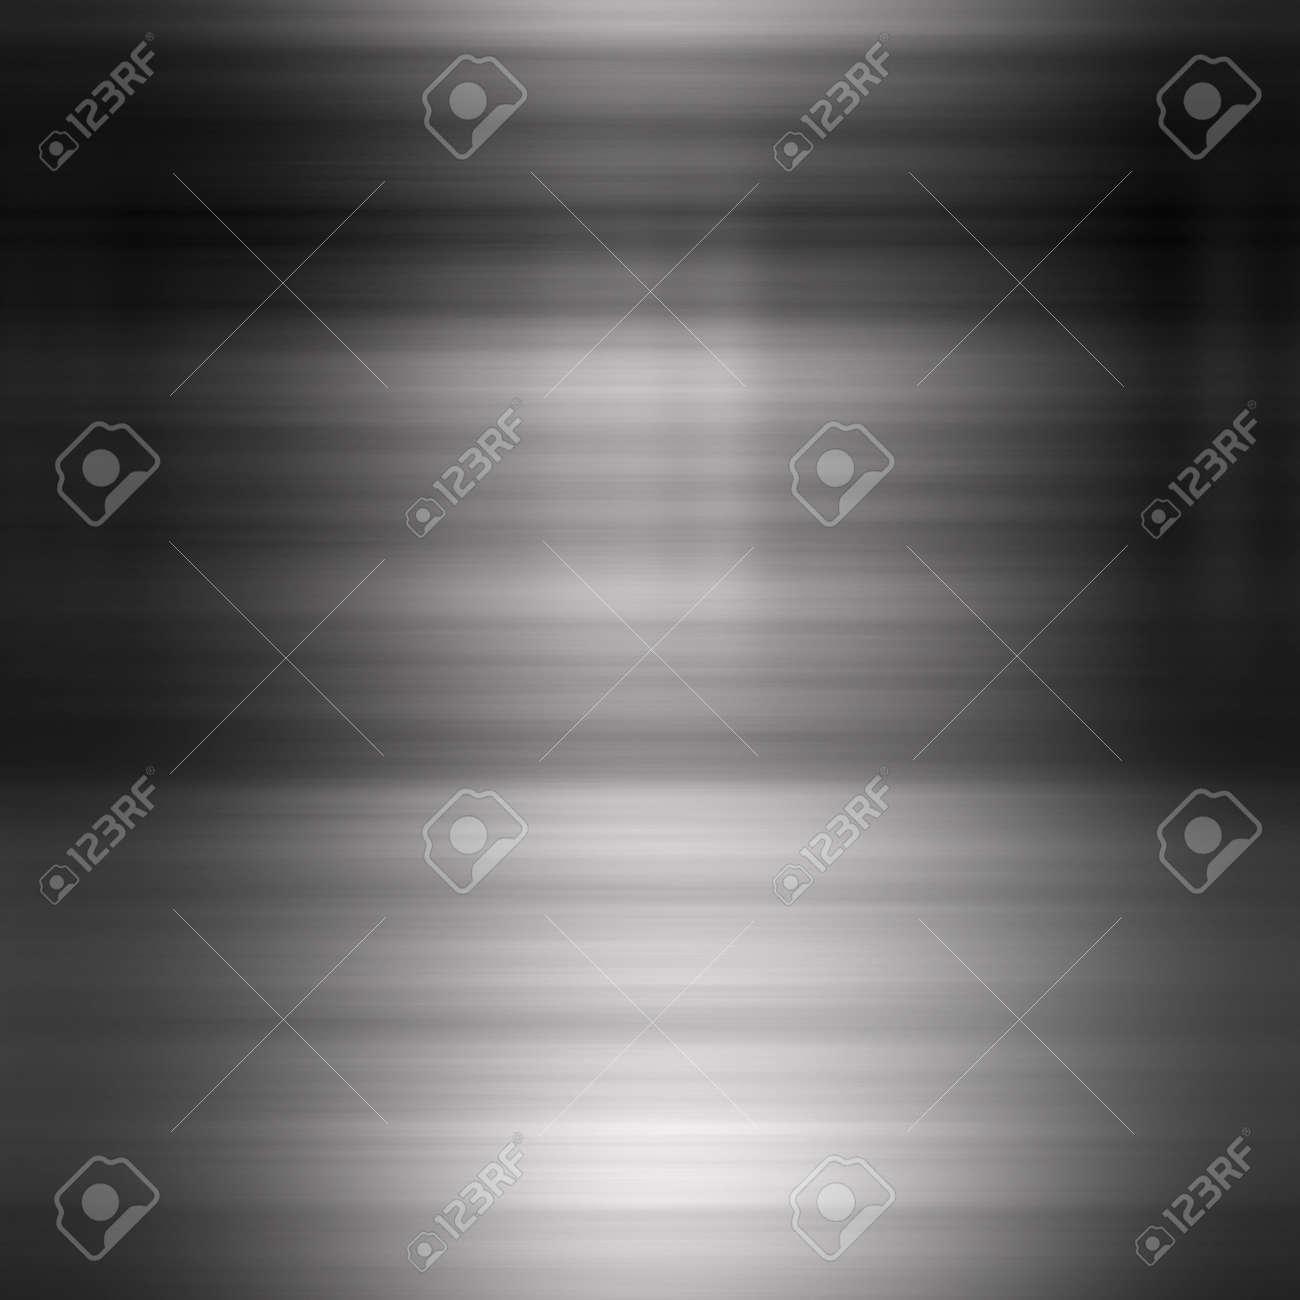 brushed dark aluminum, seamlessly tillable Stock Photo - 3807895